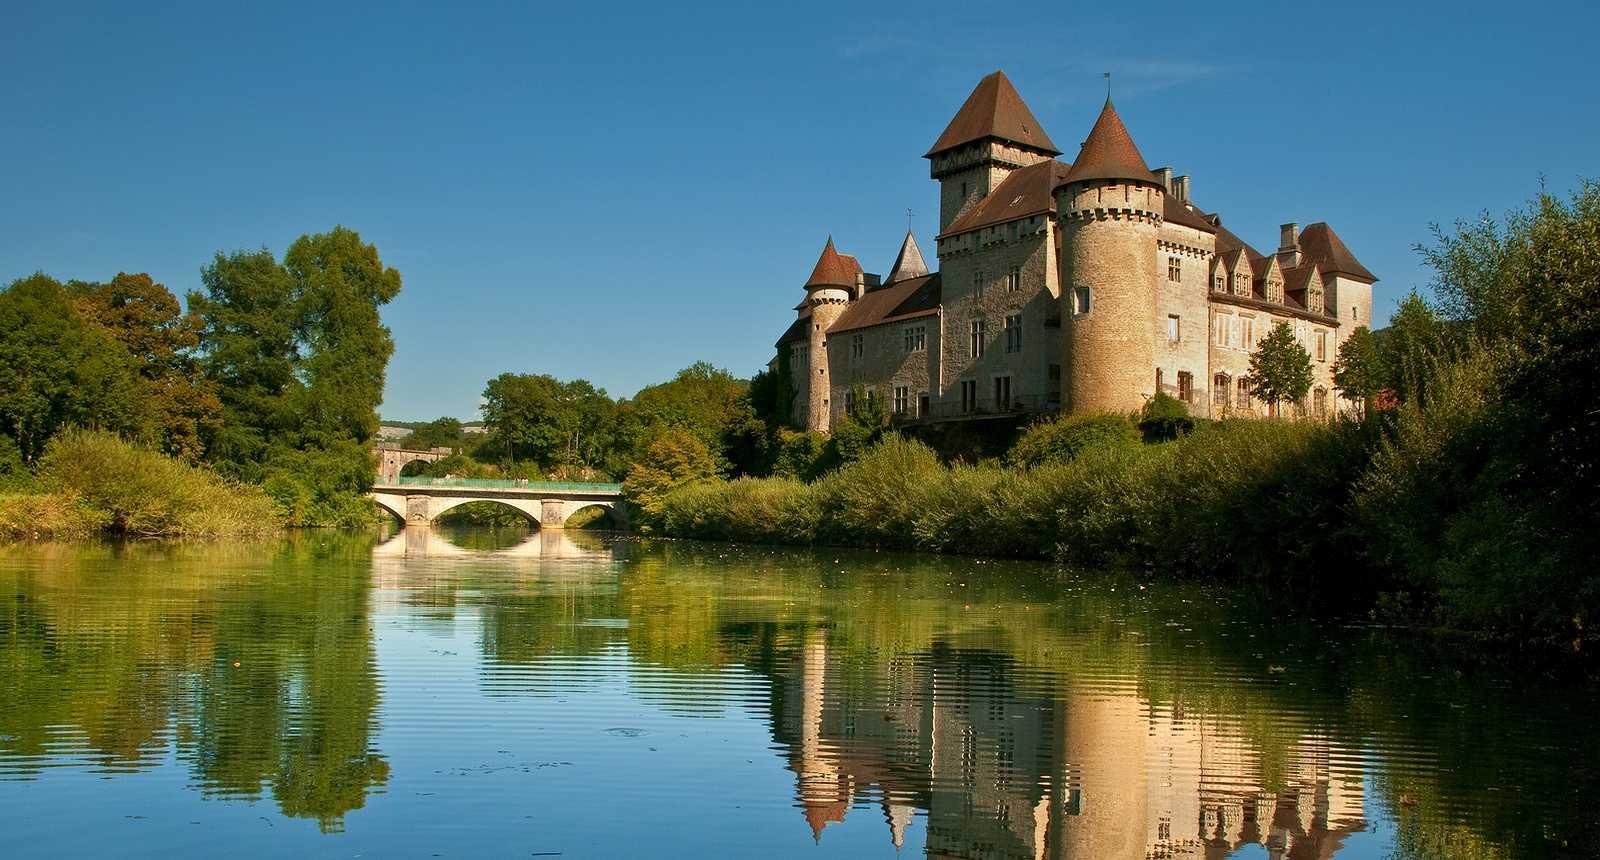 Image : Château de Cléron